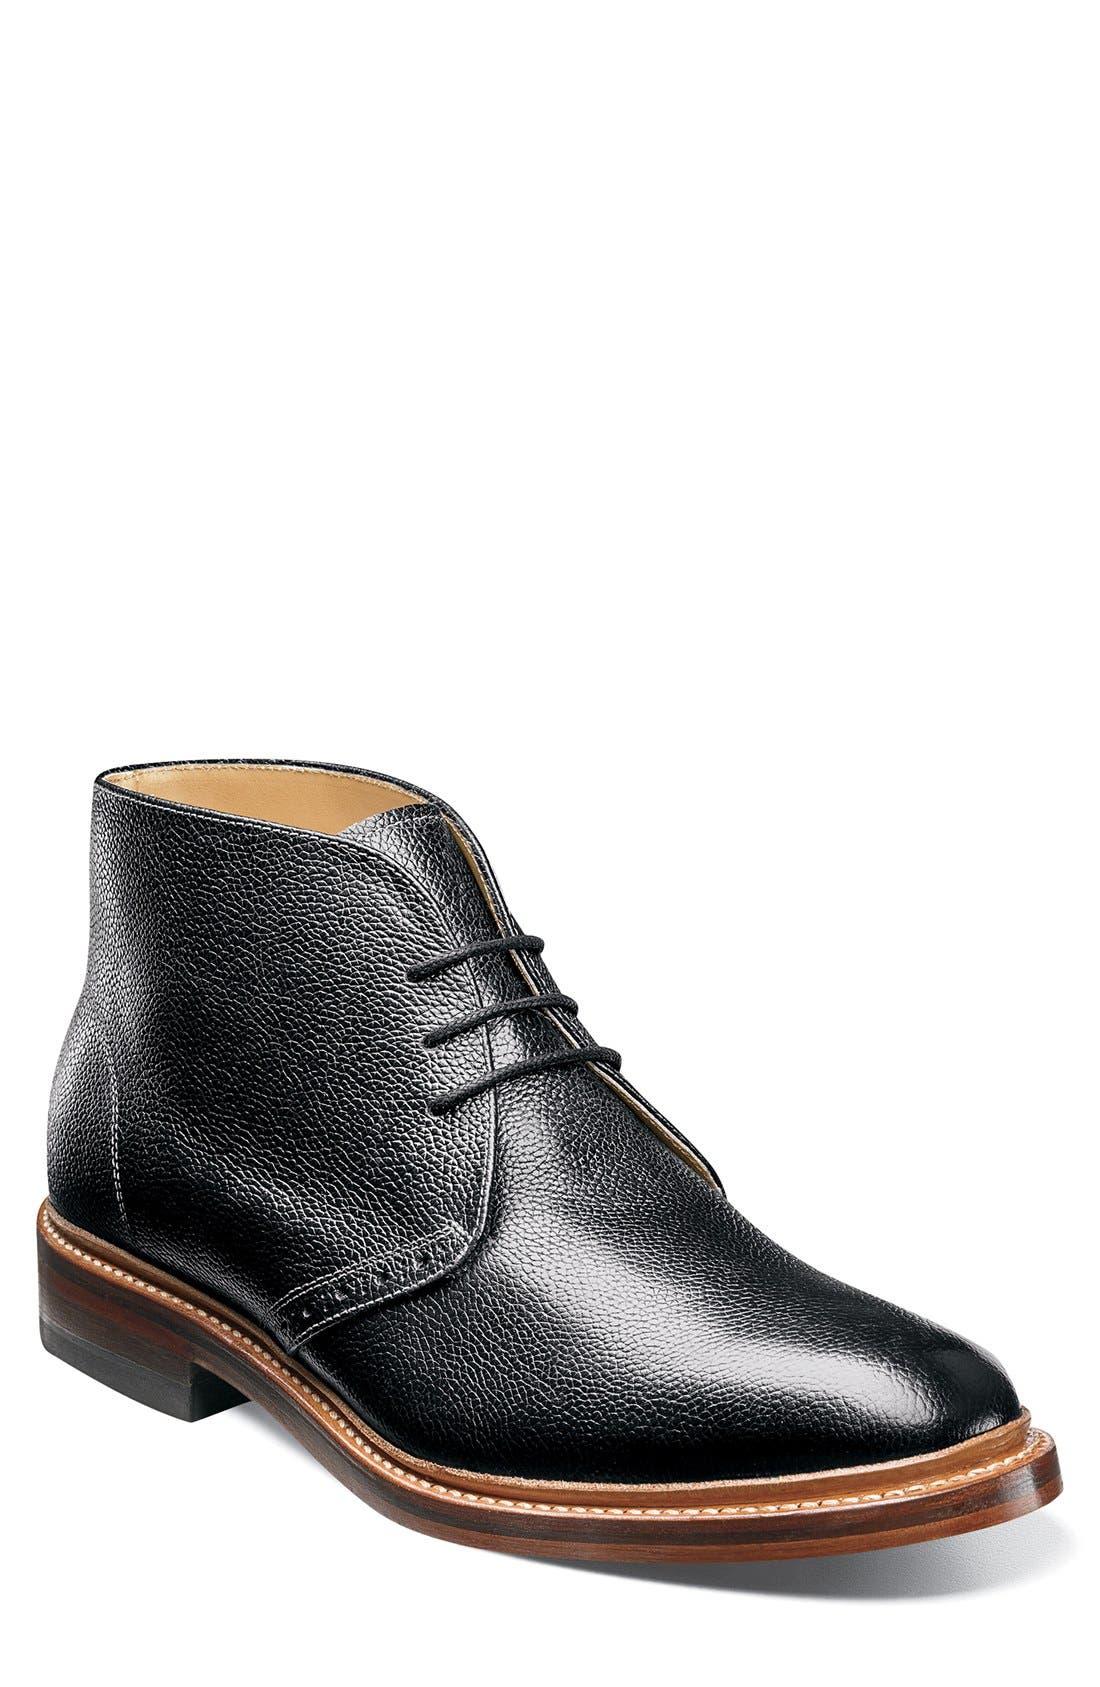 'Madison II' Chukka Boot,                             Main thumbnail 1, color,                             001